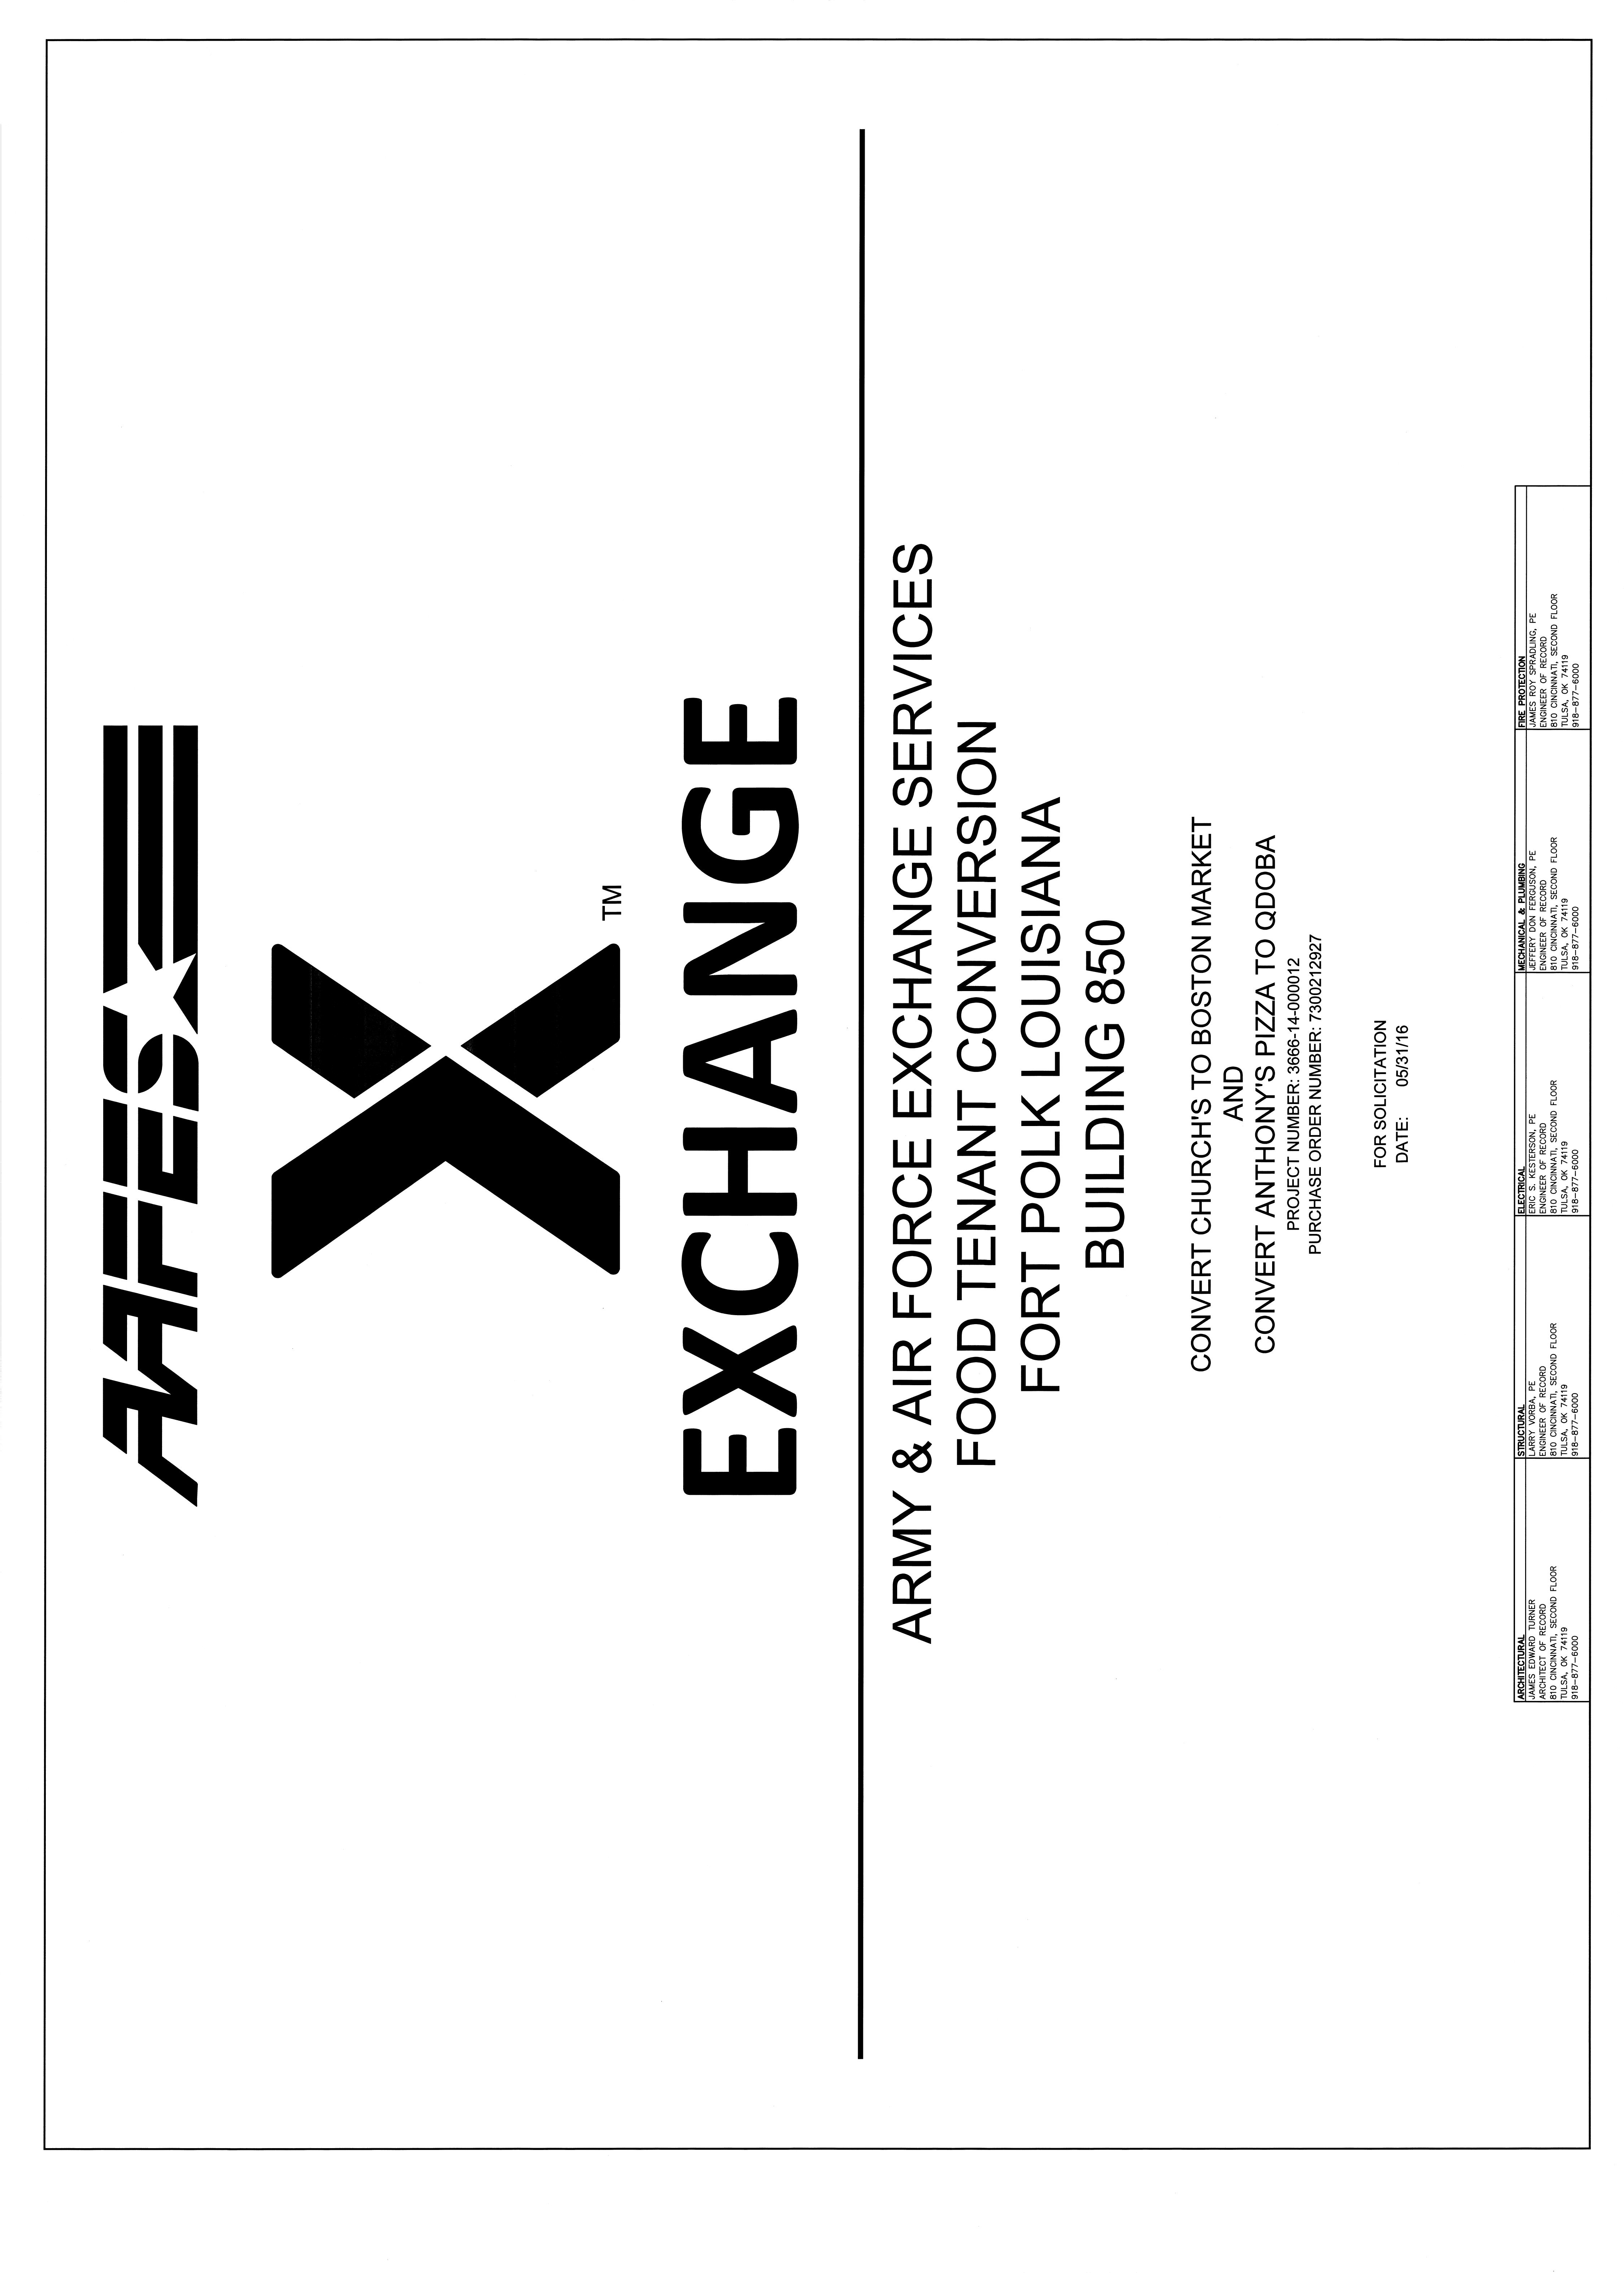 Untitled - Exchange | manualzz com